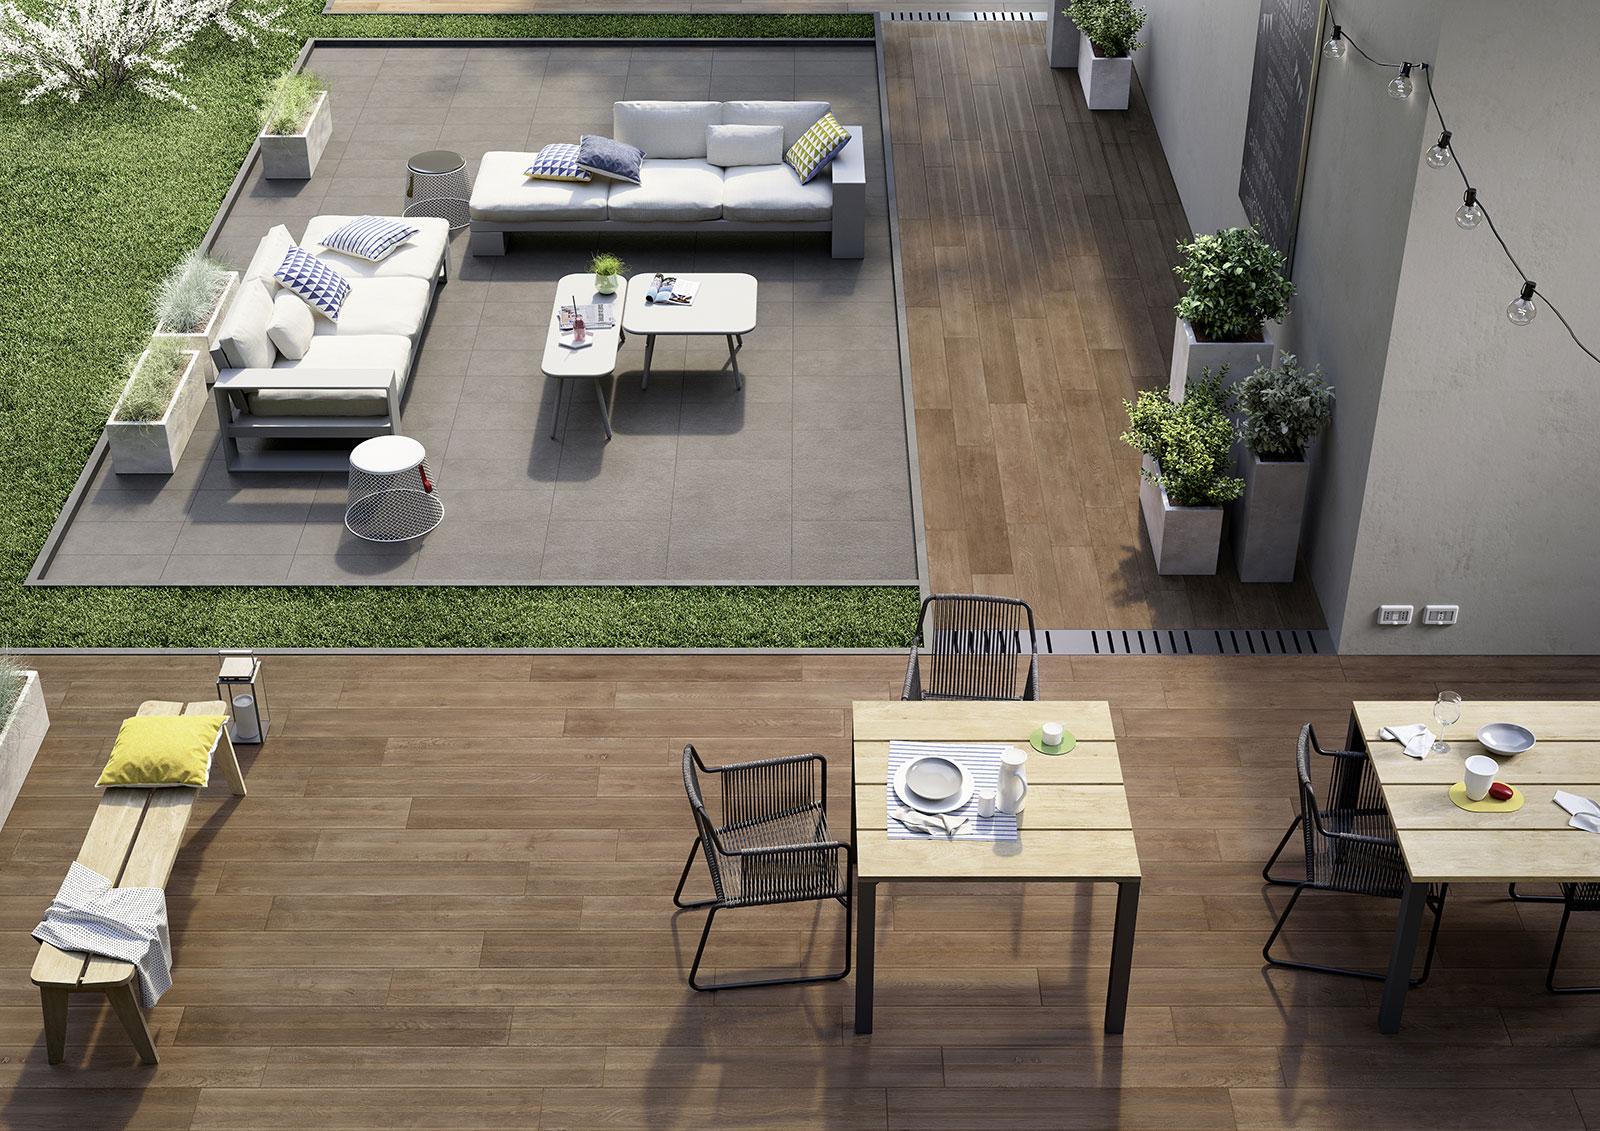 Treverktime gres imitaci n madera para pavimento marazzi - Pavimento imitacion madera ...